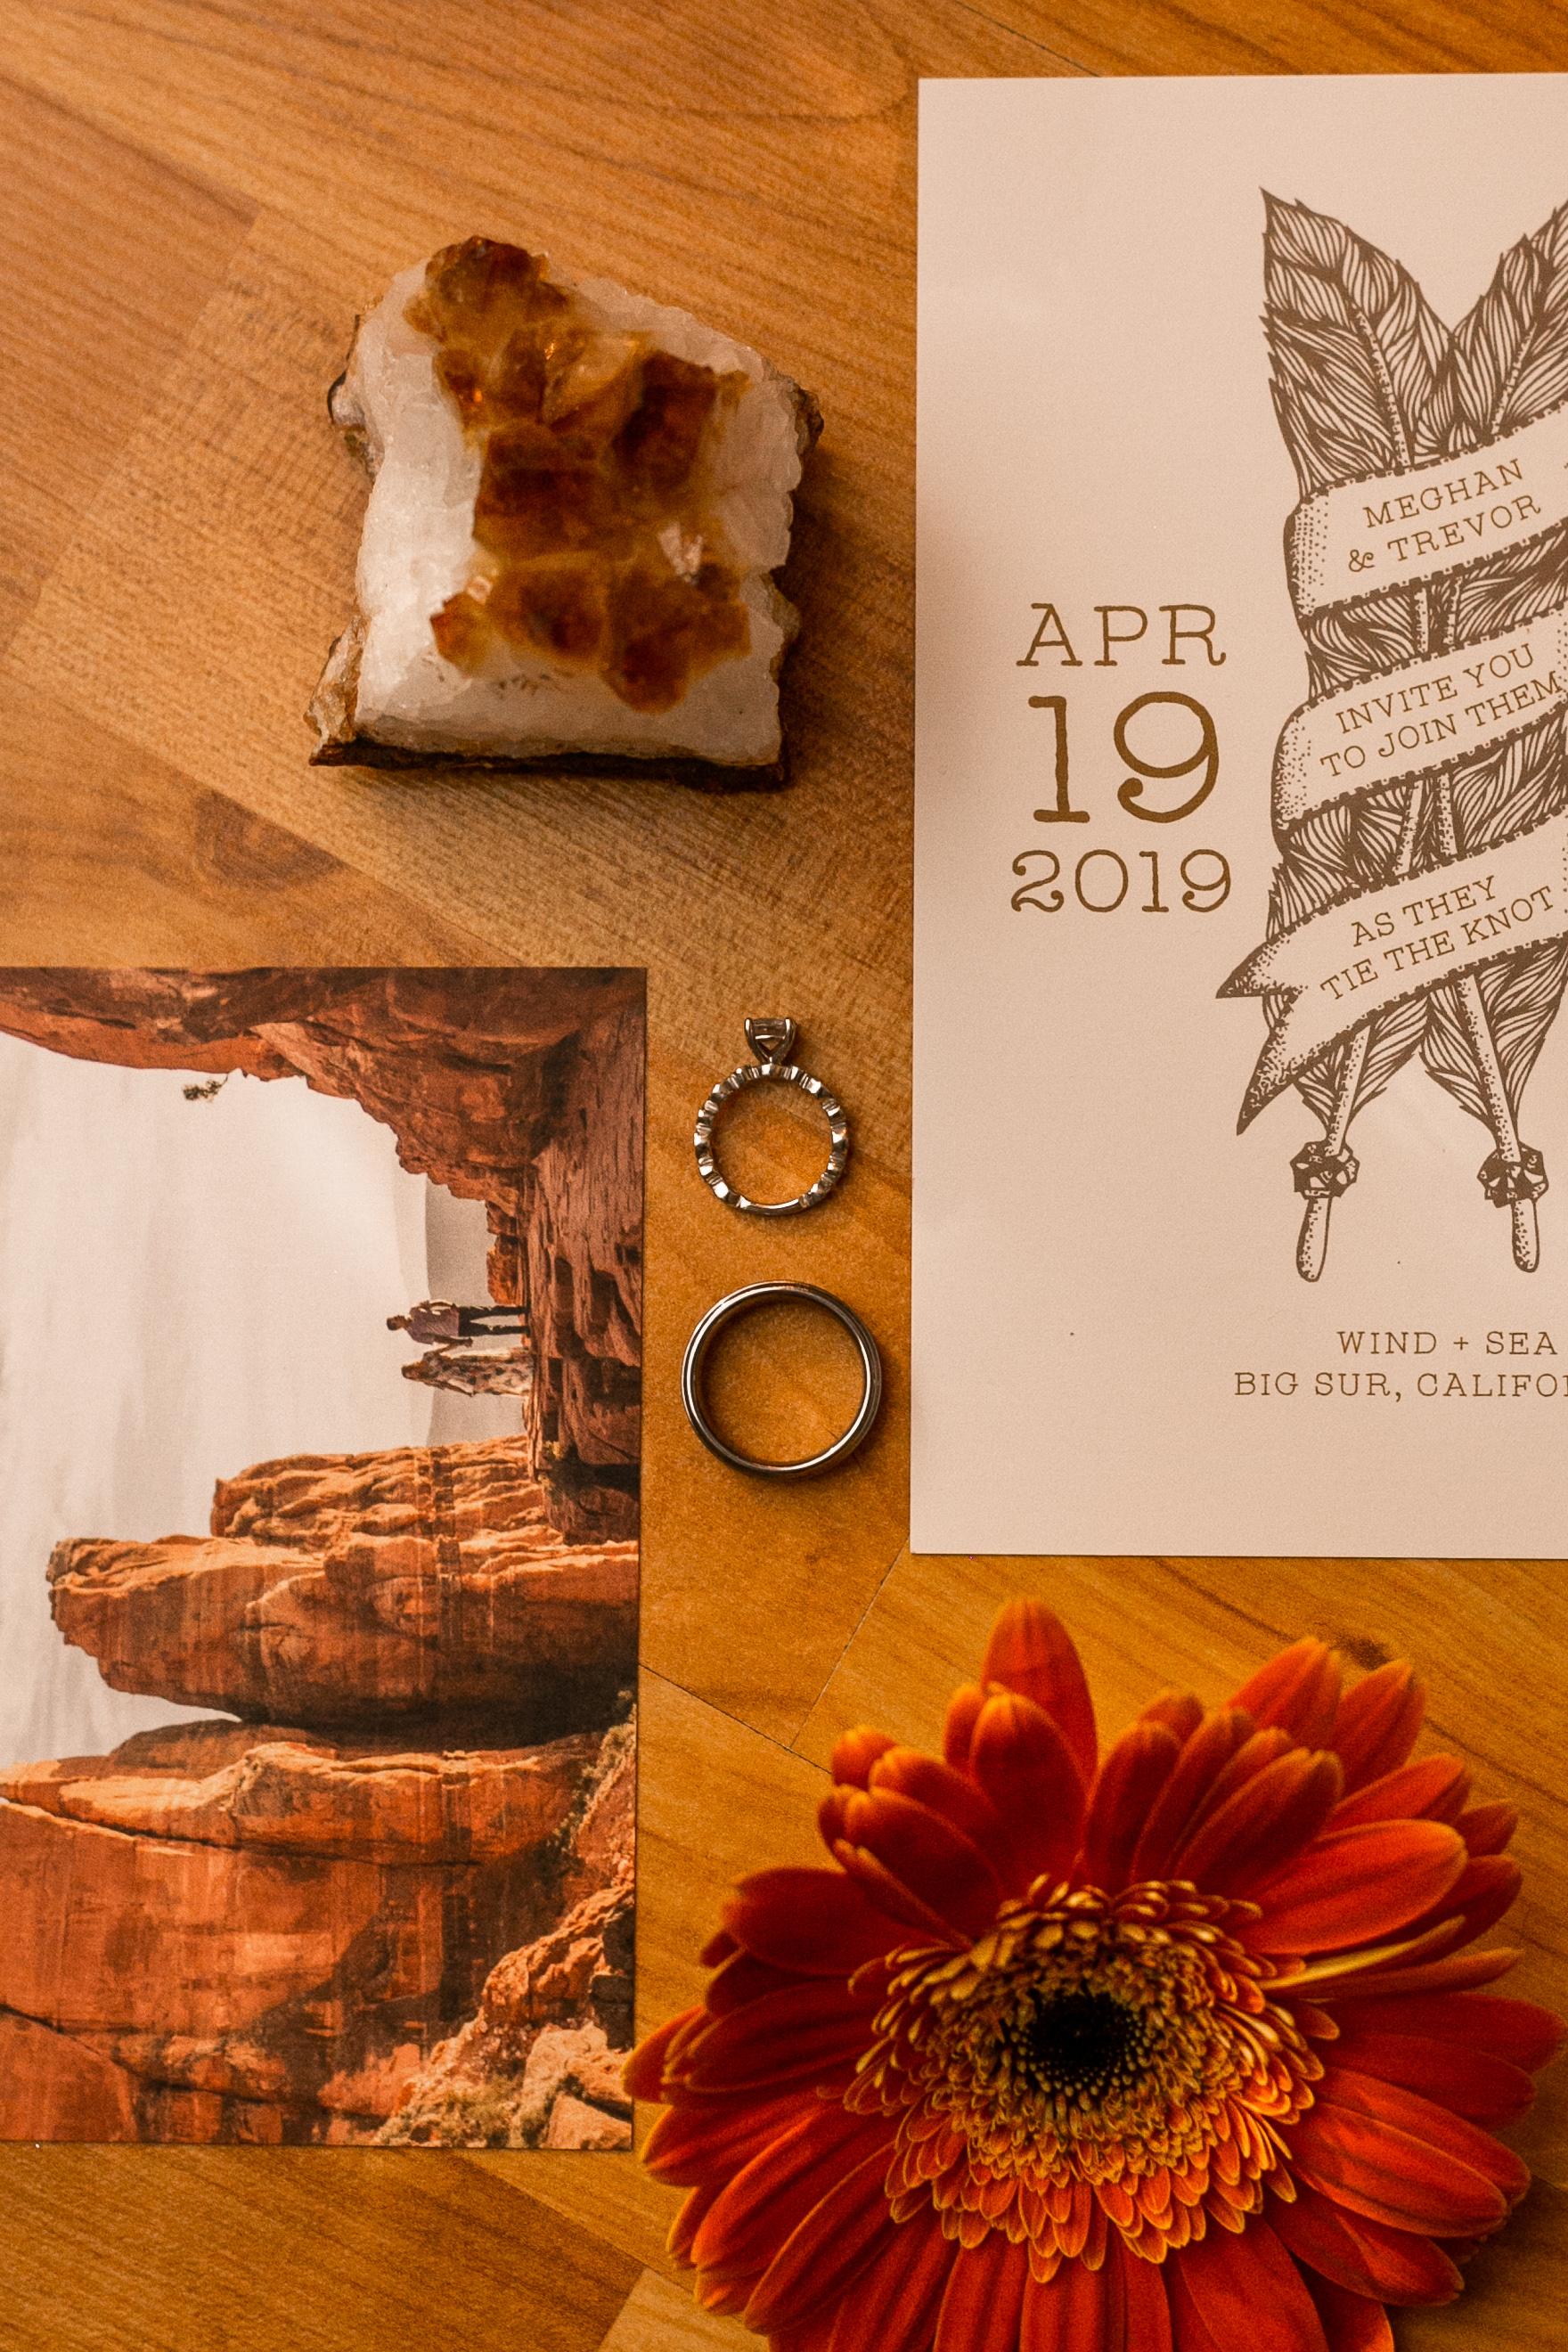 BASIC-INVITE-CUSTOM-WEDDING-INVITATIONS13.jpg